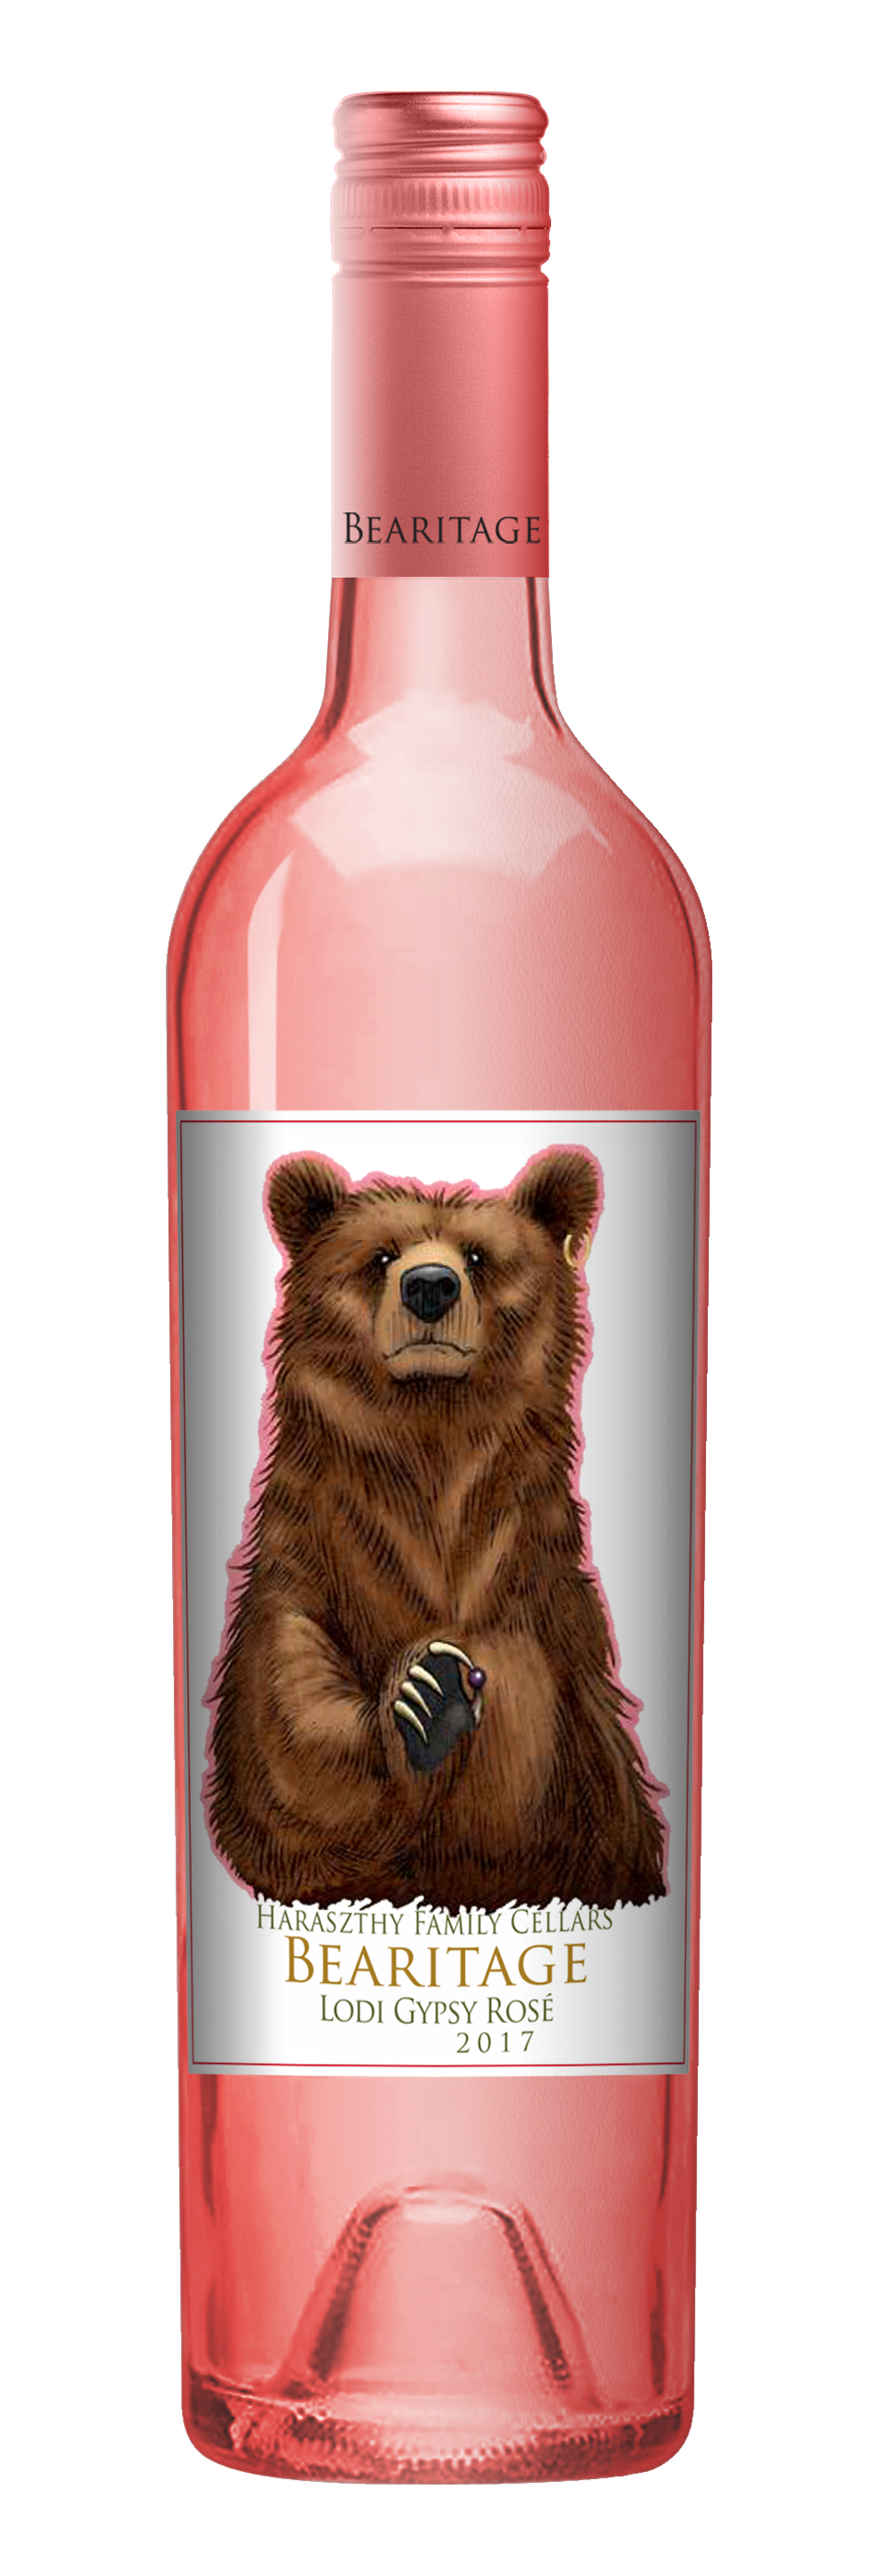 Haraszthy Family Cellars Releases Bearitage Lodi Gypsy Rosé